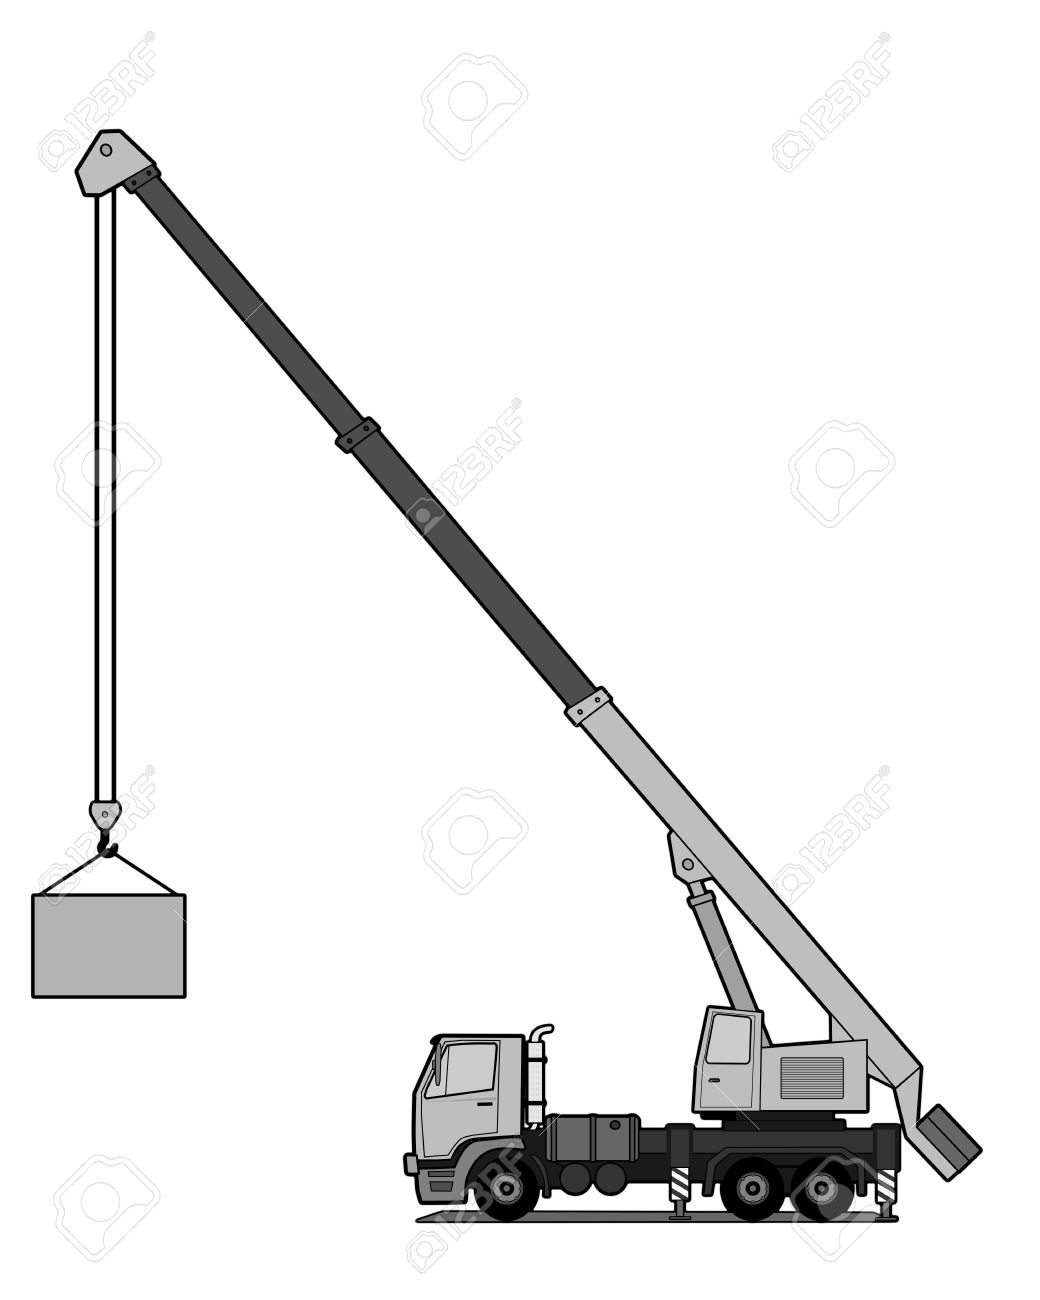 Crane Truck Drawing At Getdrawings